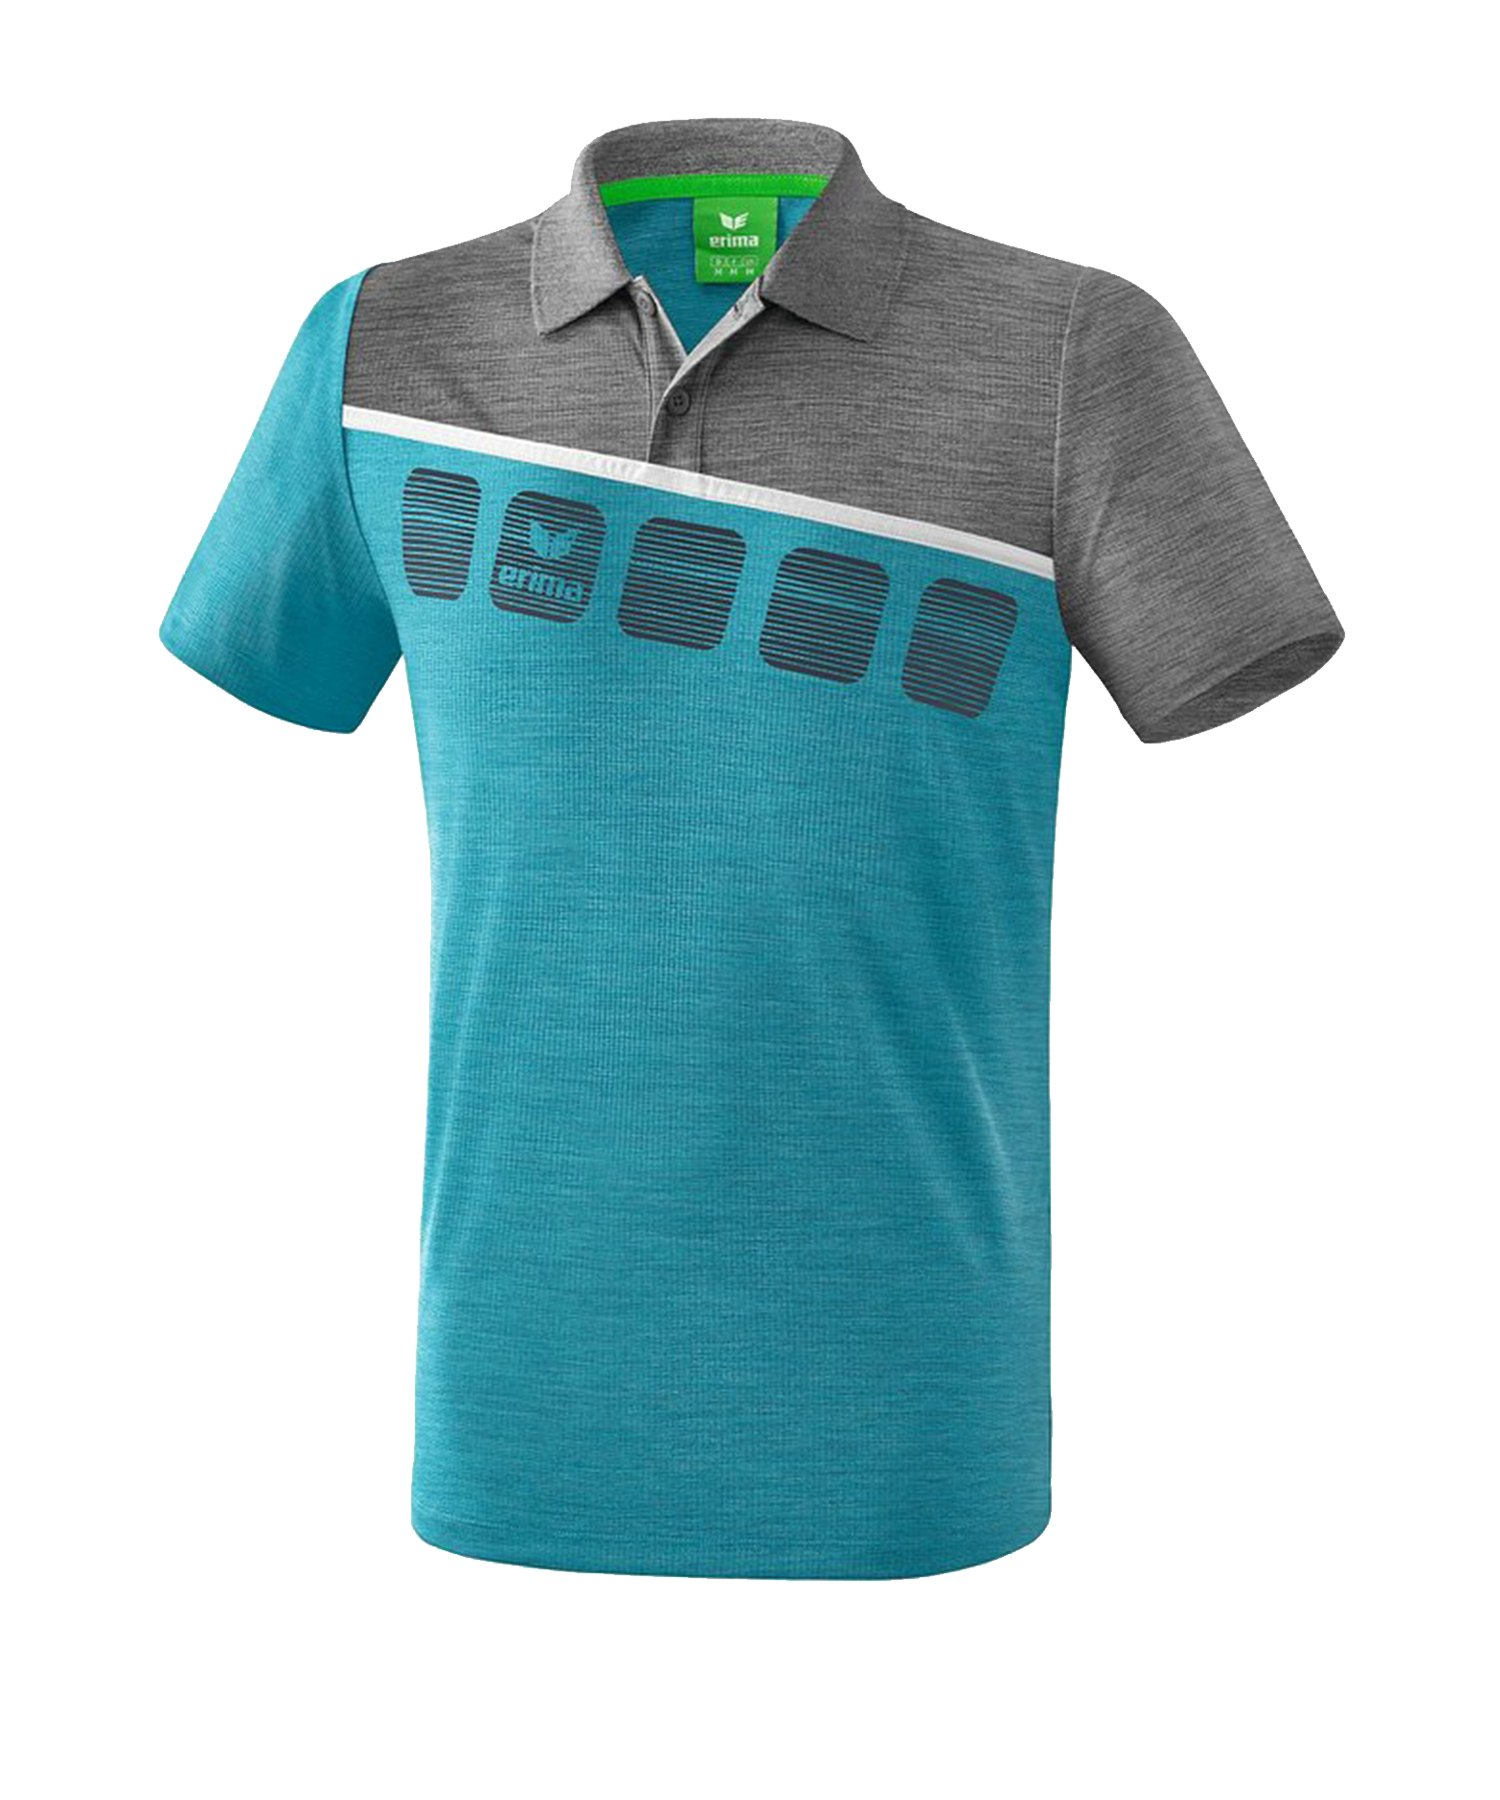 Erima 5-C Poloshirt Blau Grau - Blau